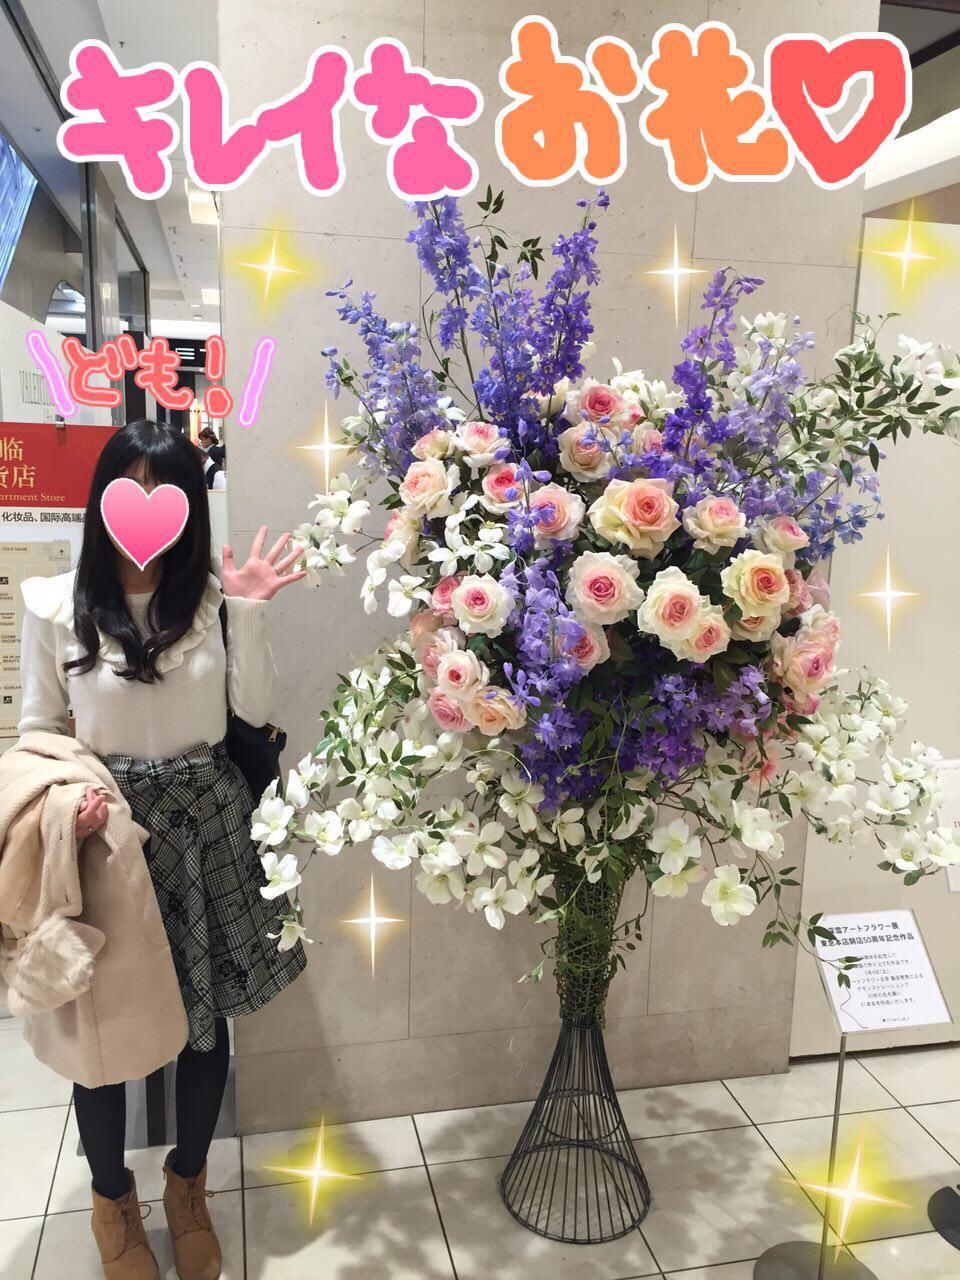 photo_2017-02-06_23-40-11.jpg